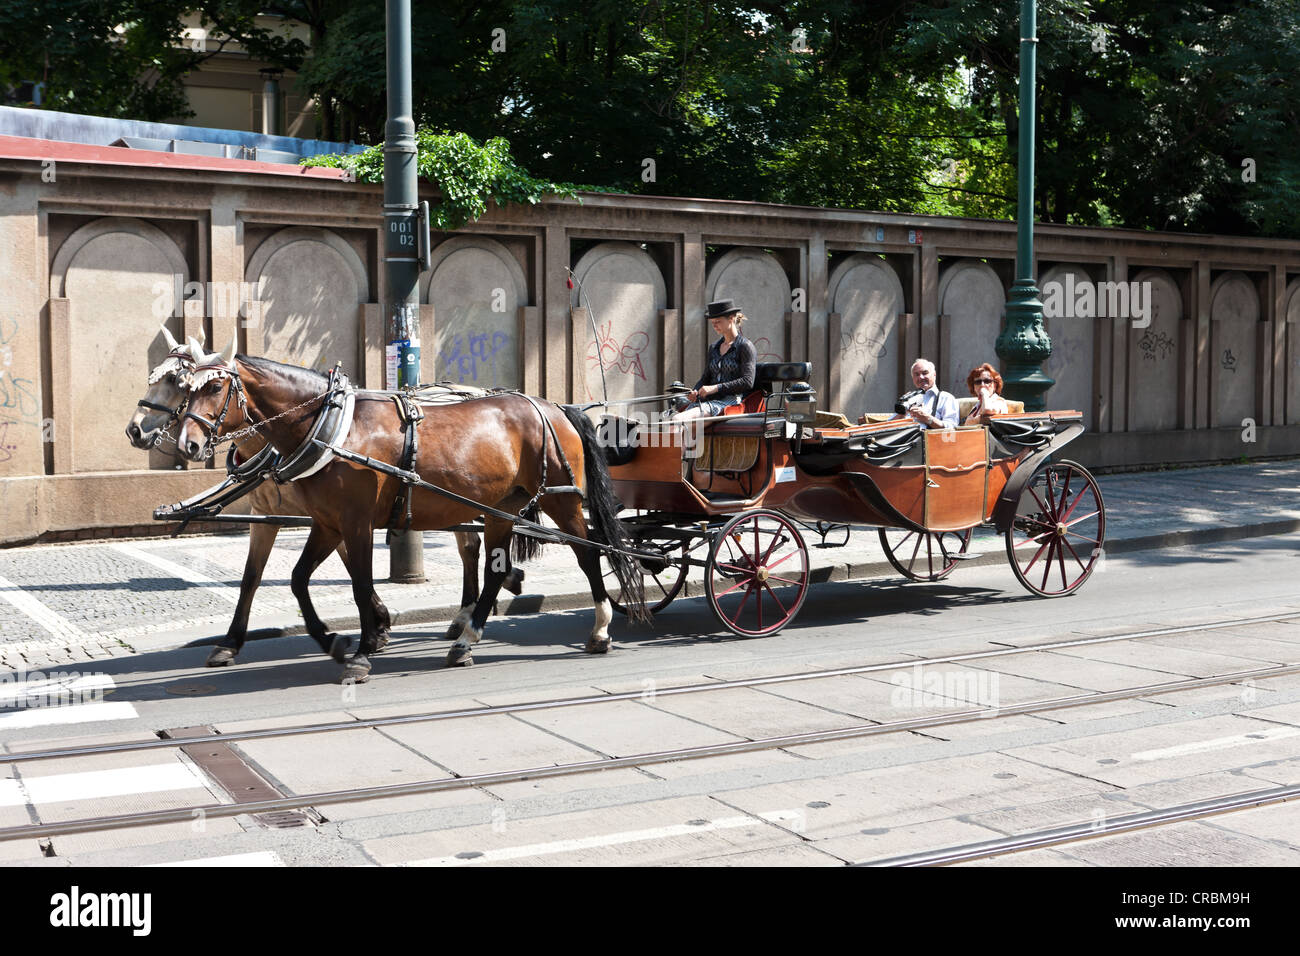 Horse carriage driving tourists through Prague, Czech Republic, Europe - Stock Image